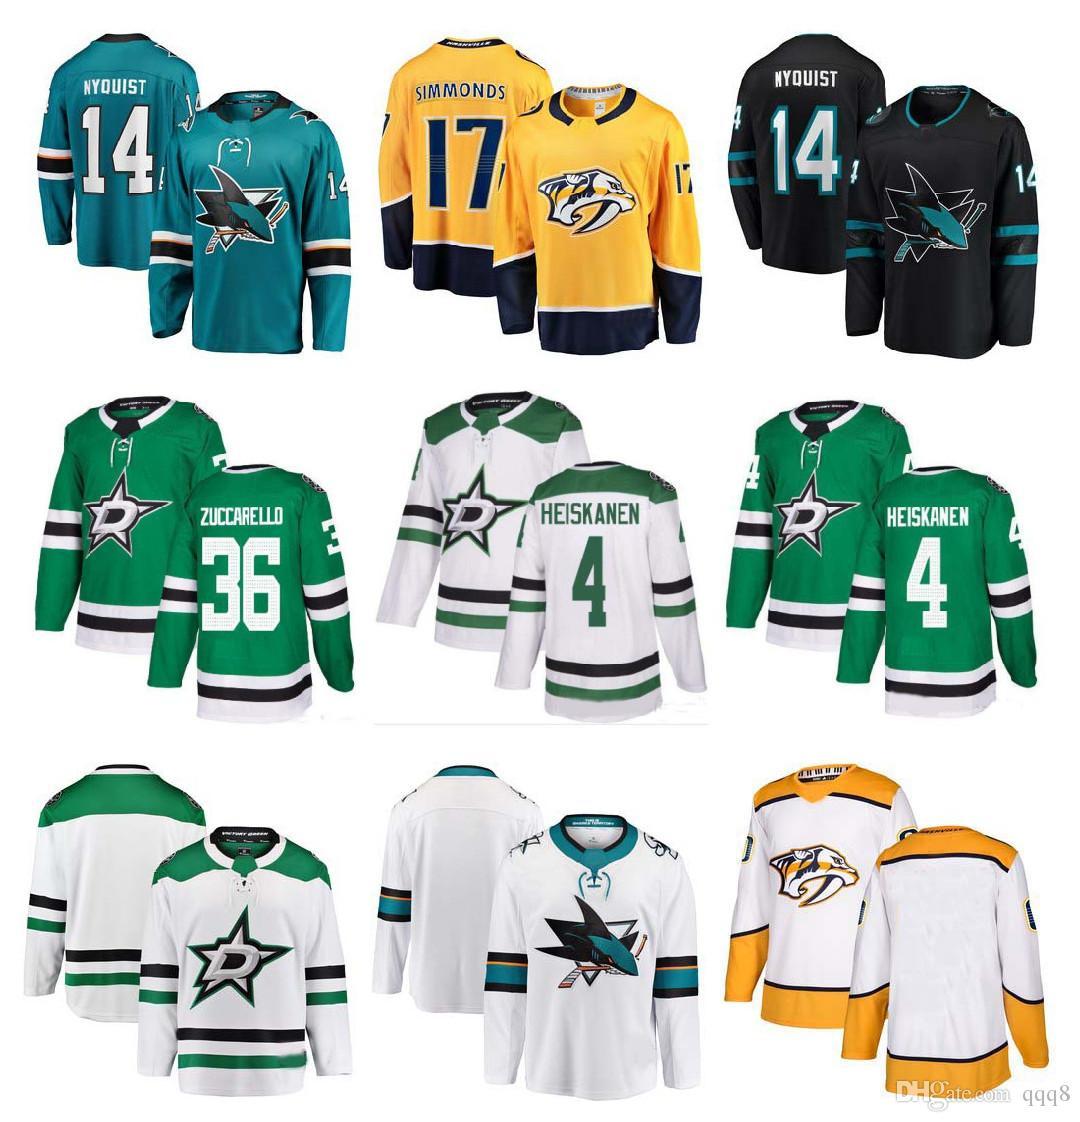 buy popular 52ea6 87f9c NHL Dallas Stars Jersey 36 Mats Zuccarello 4 Miro Heiskanen San Jose Sharks  14 Gustav Nyquist Nashville Predators 17 Wayne Simmonds Hockey